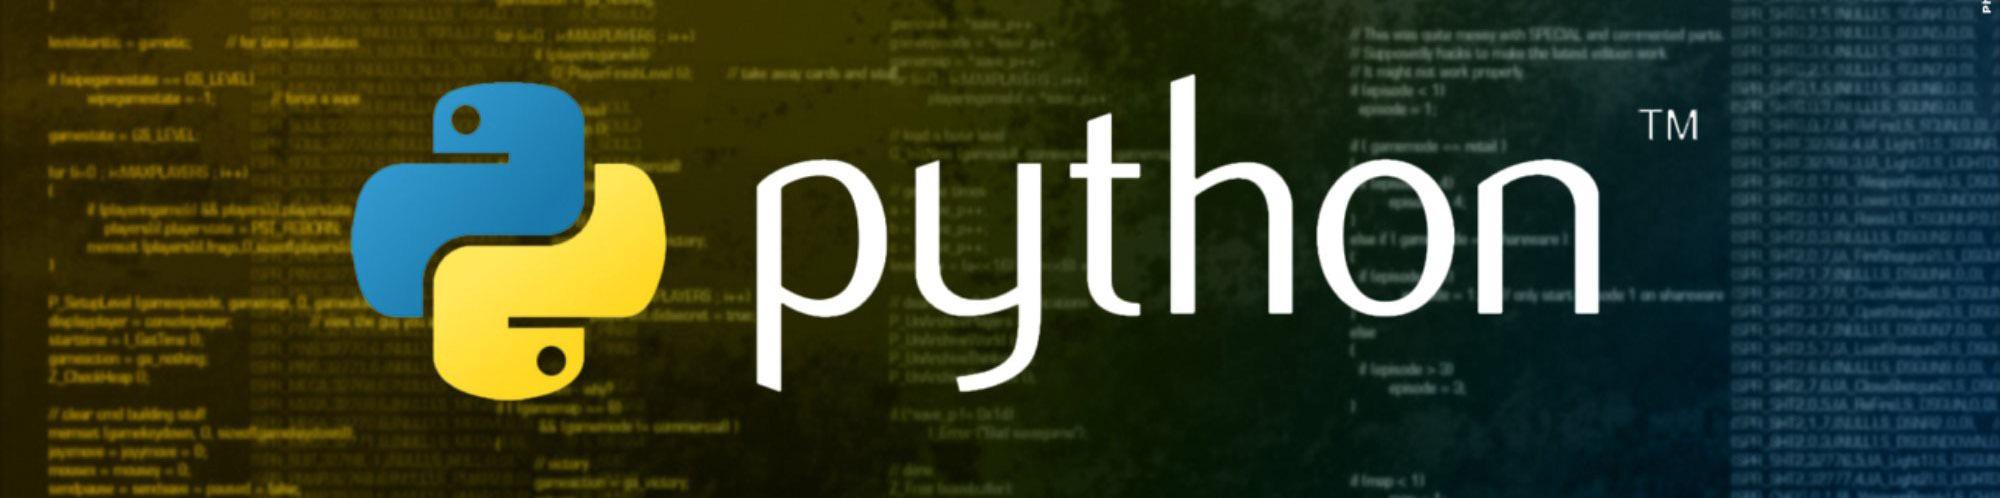 Training in python